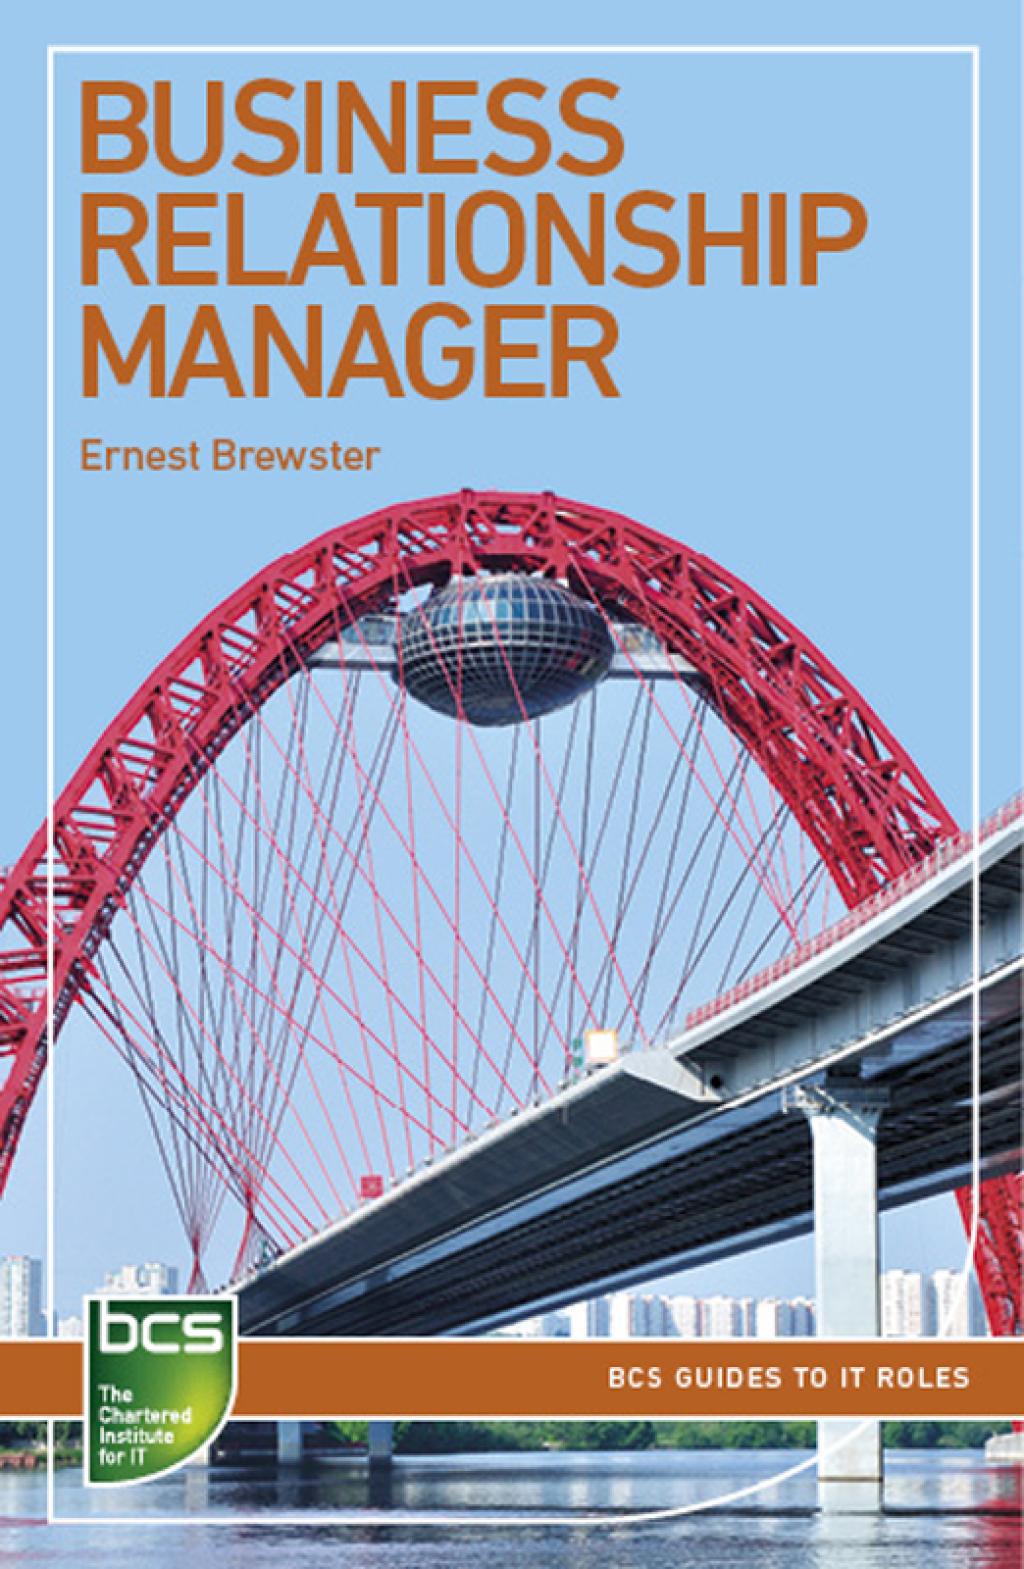 Business Relationship Manager (eBook)